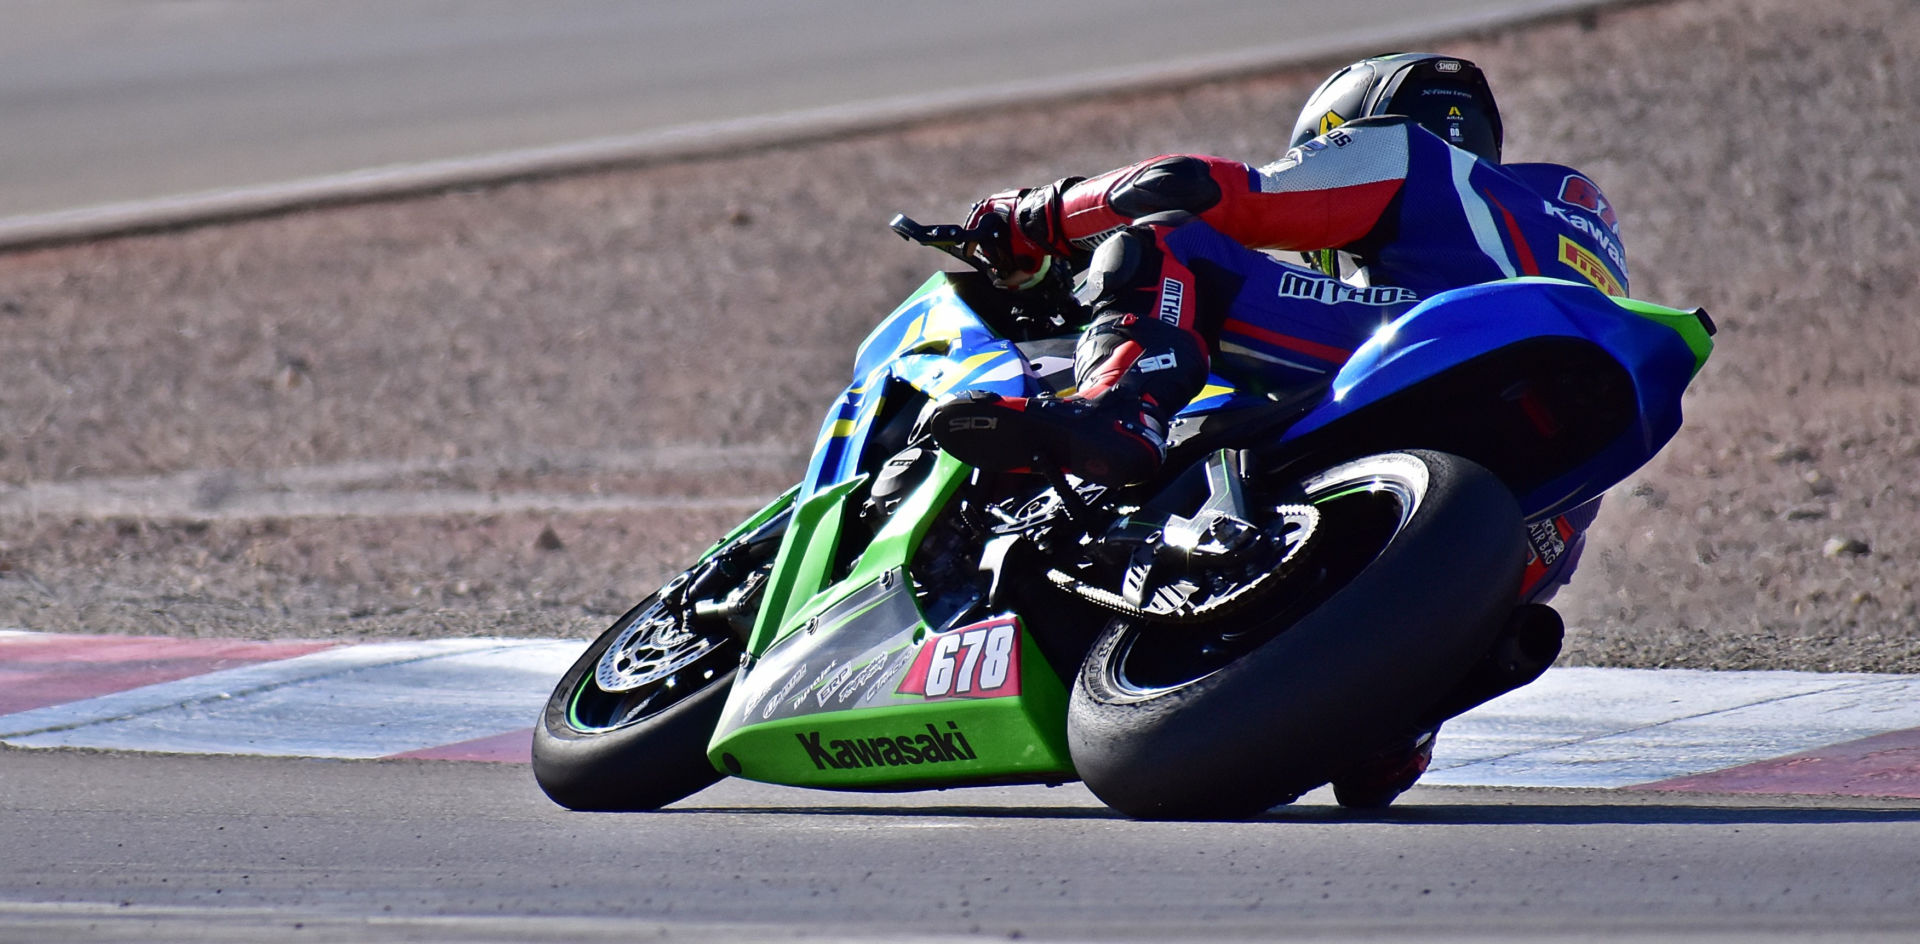 WERA West: Zvik Goes On A Winning Streak In Las Vegas